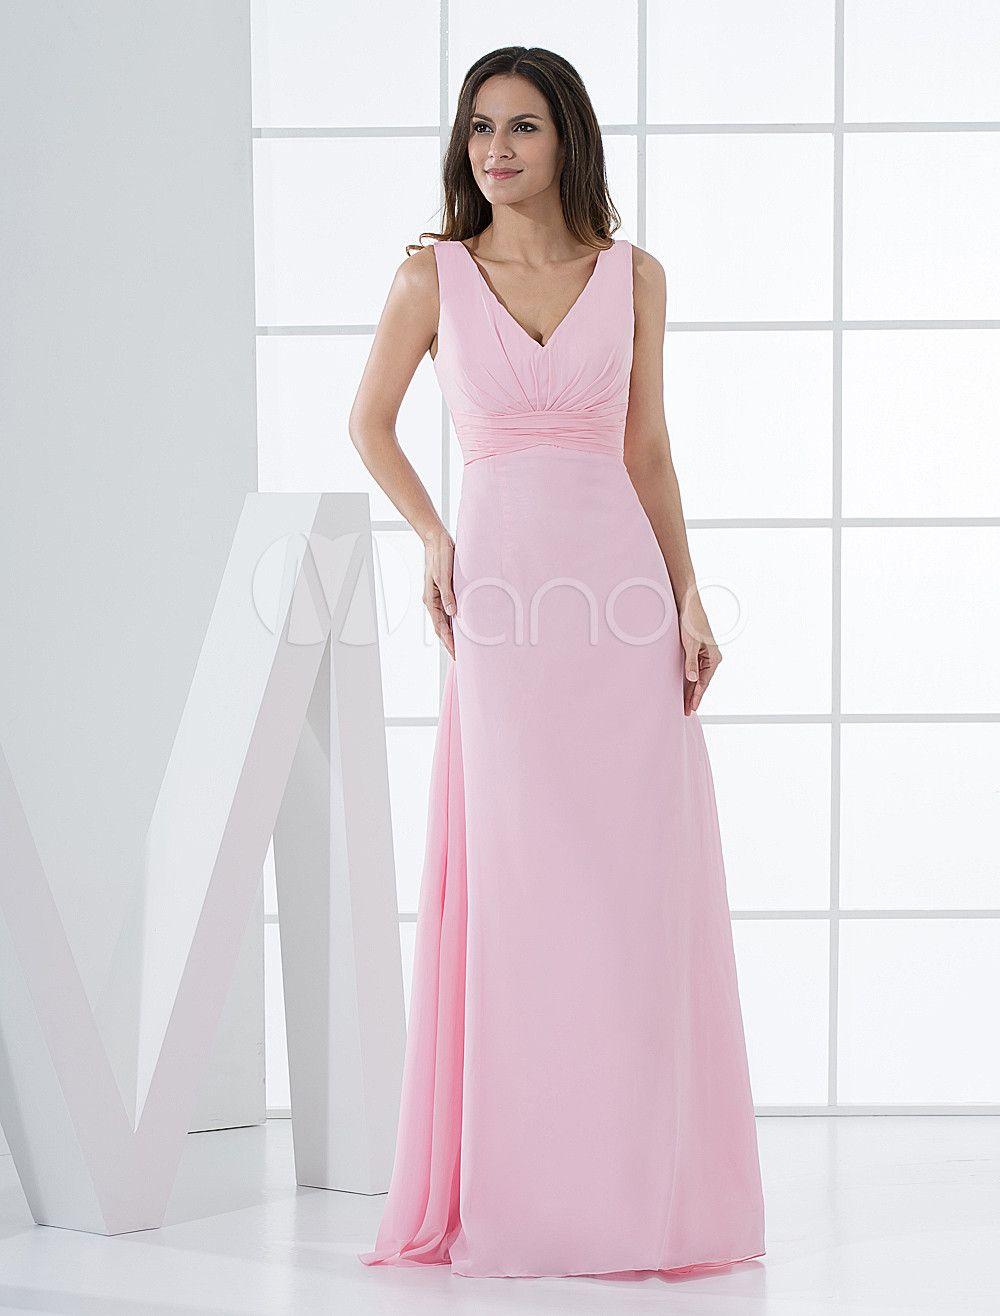 Robe demoiselle d'honneur en chiffon rose de col V